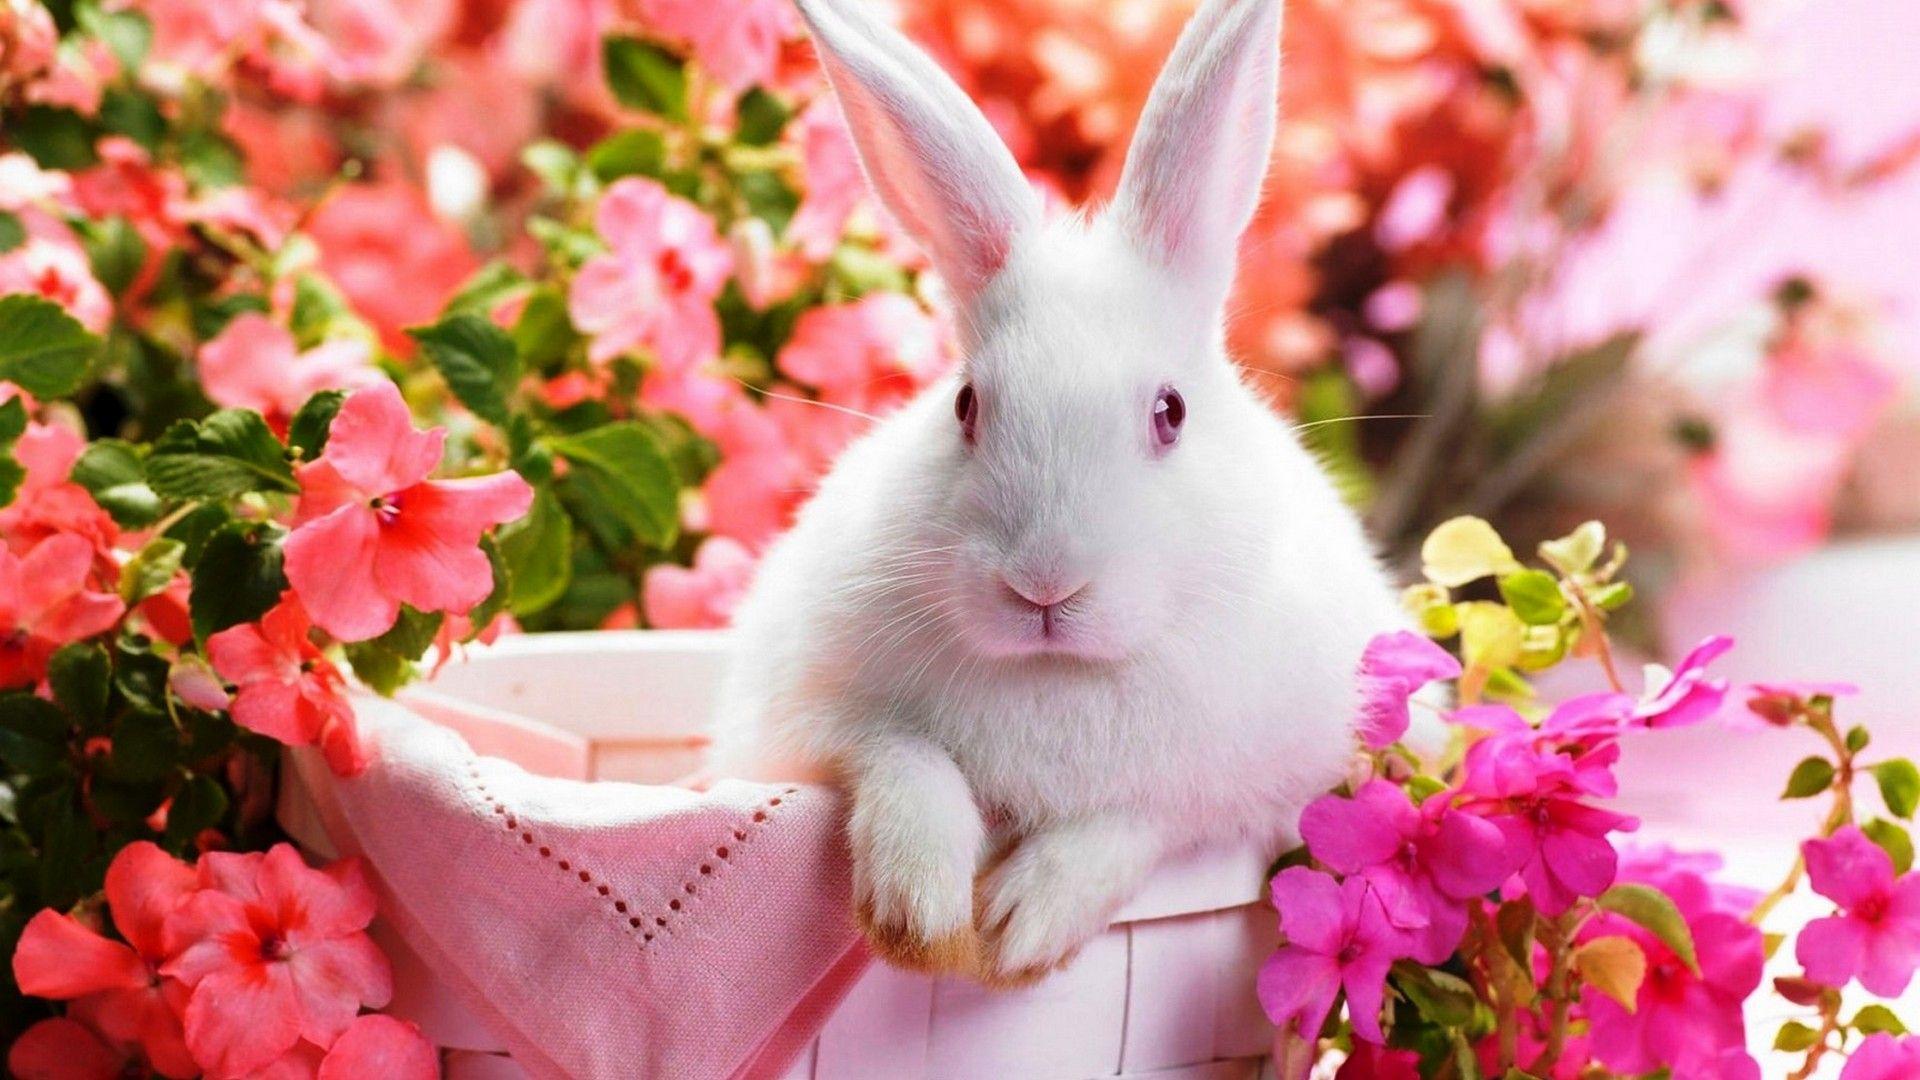 Cute Rabbit Wallpaper Hd